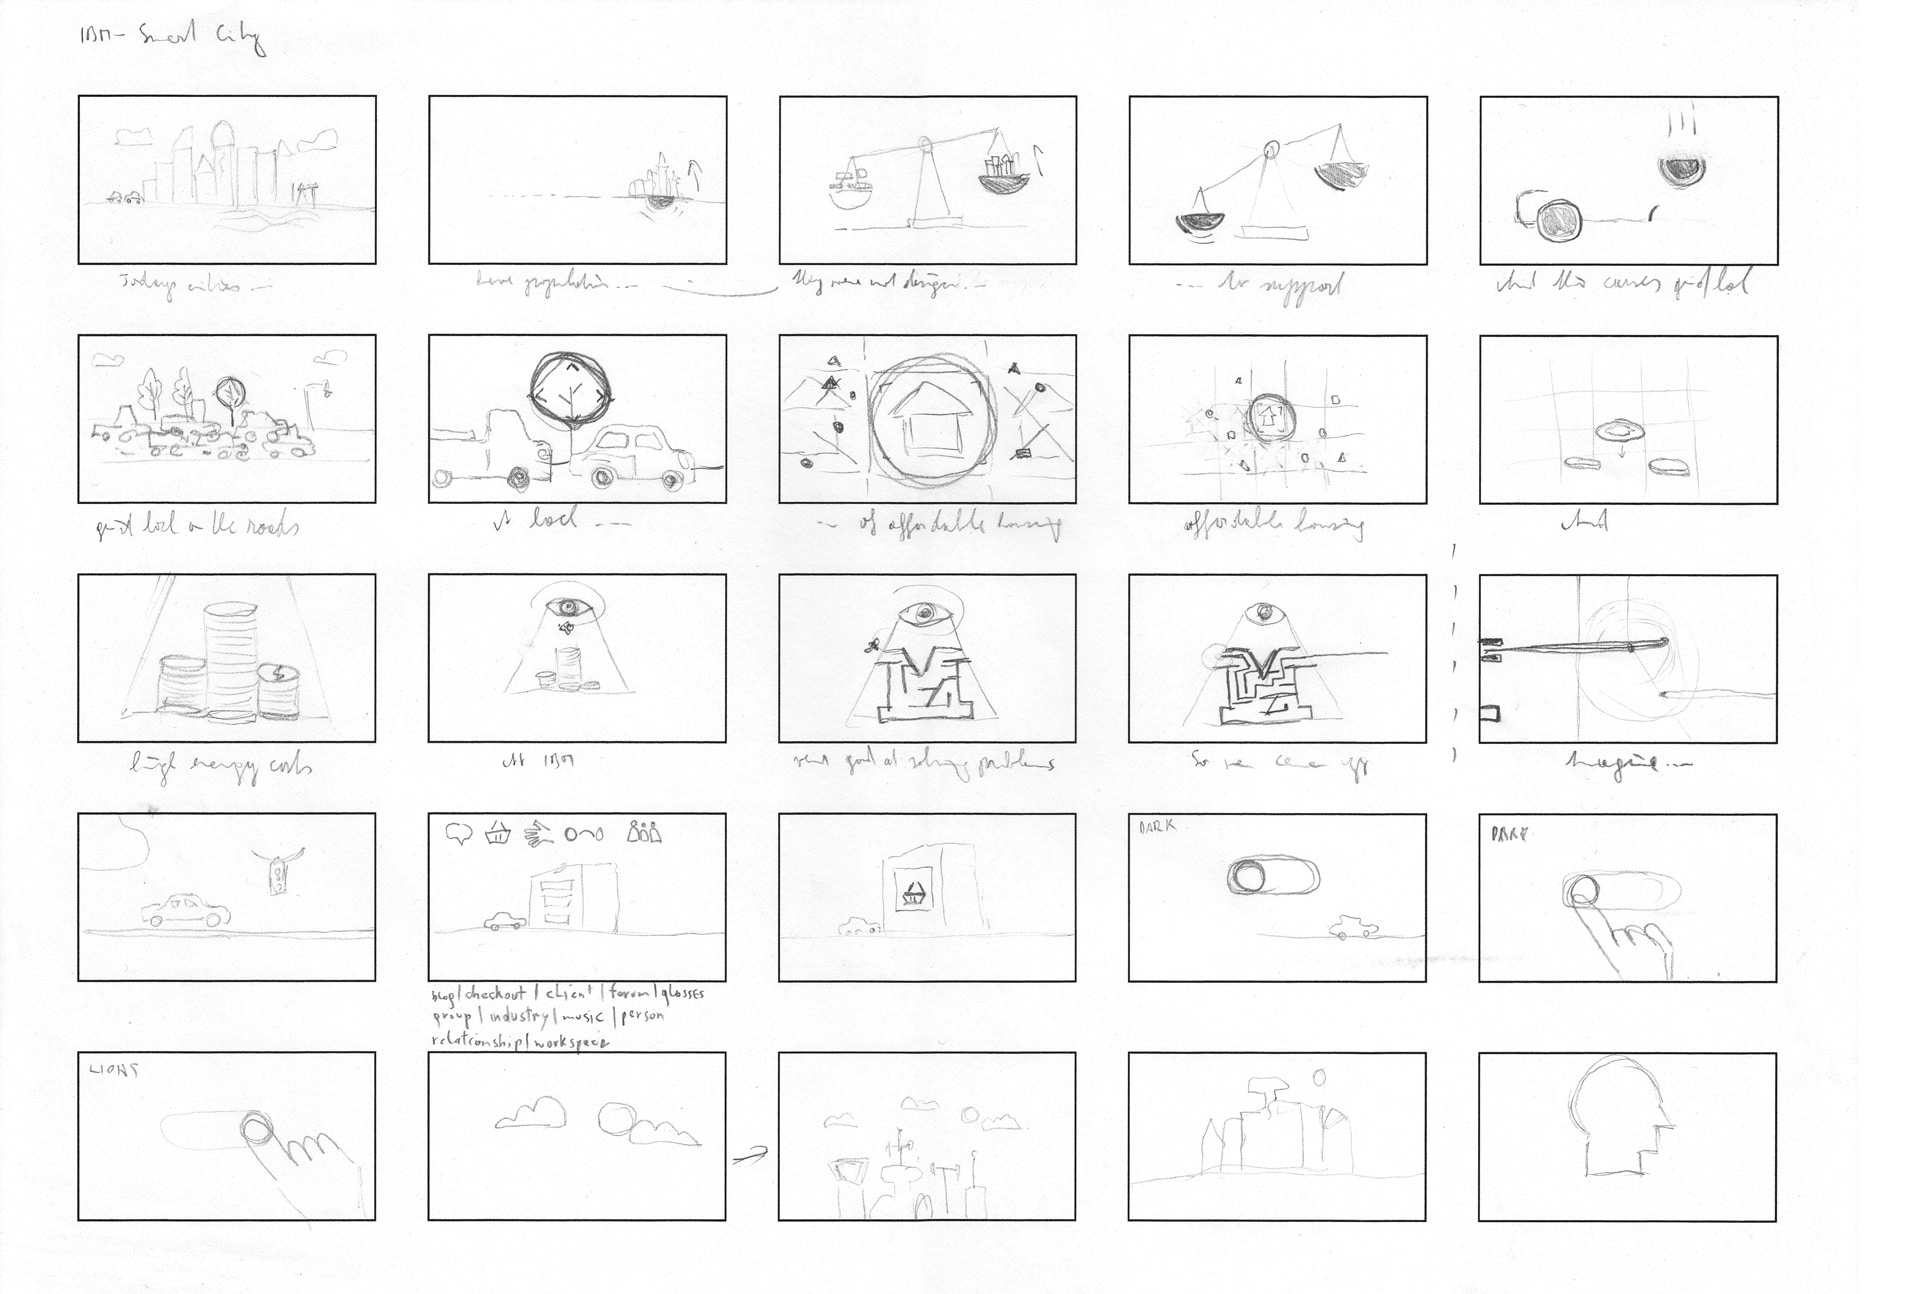 IBM Storyboard